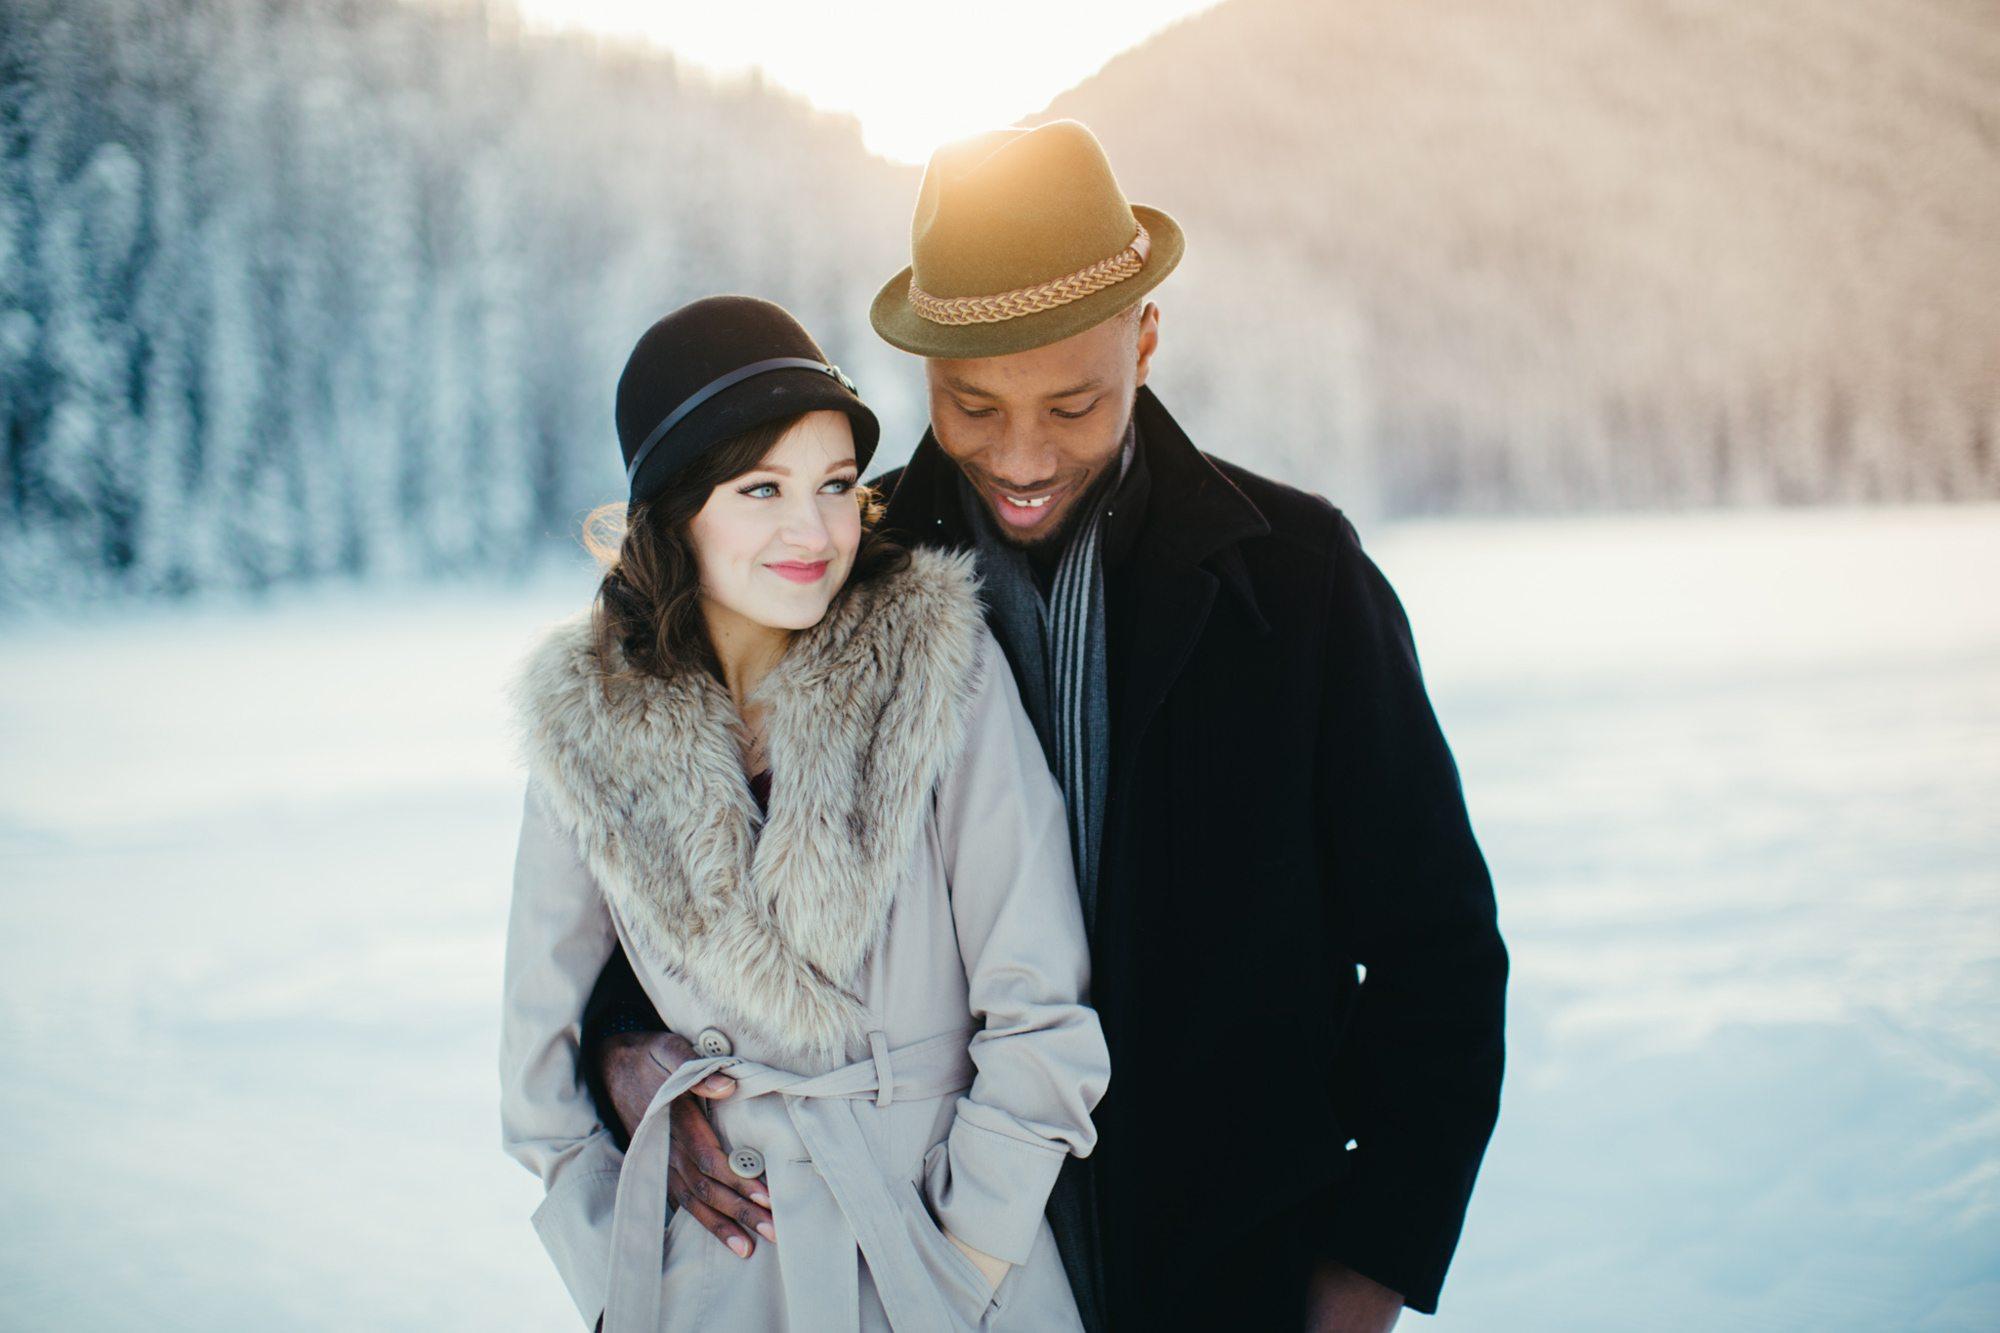 042-adventure-engagement-photographer